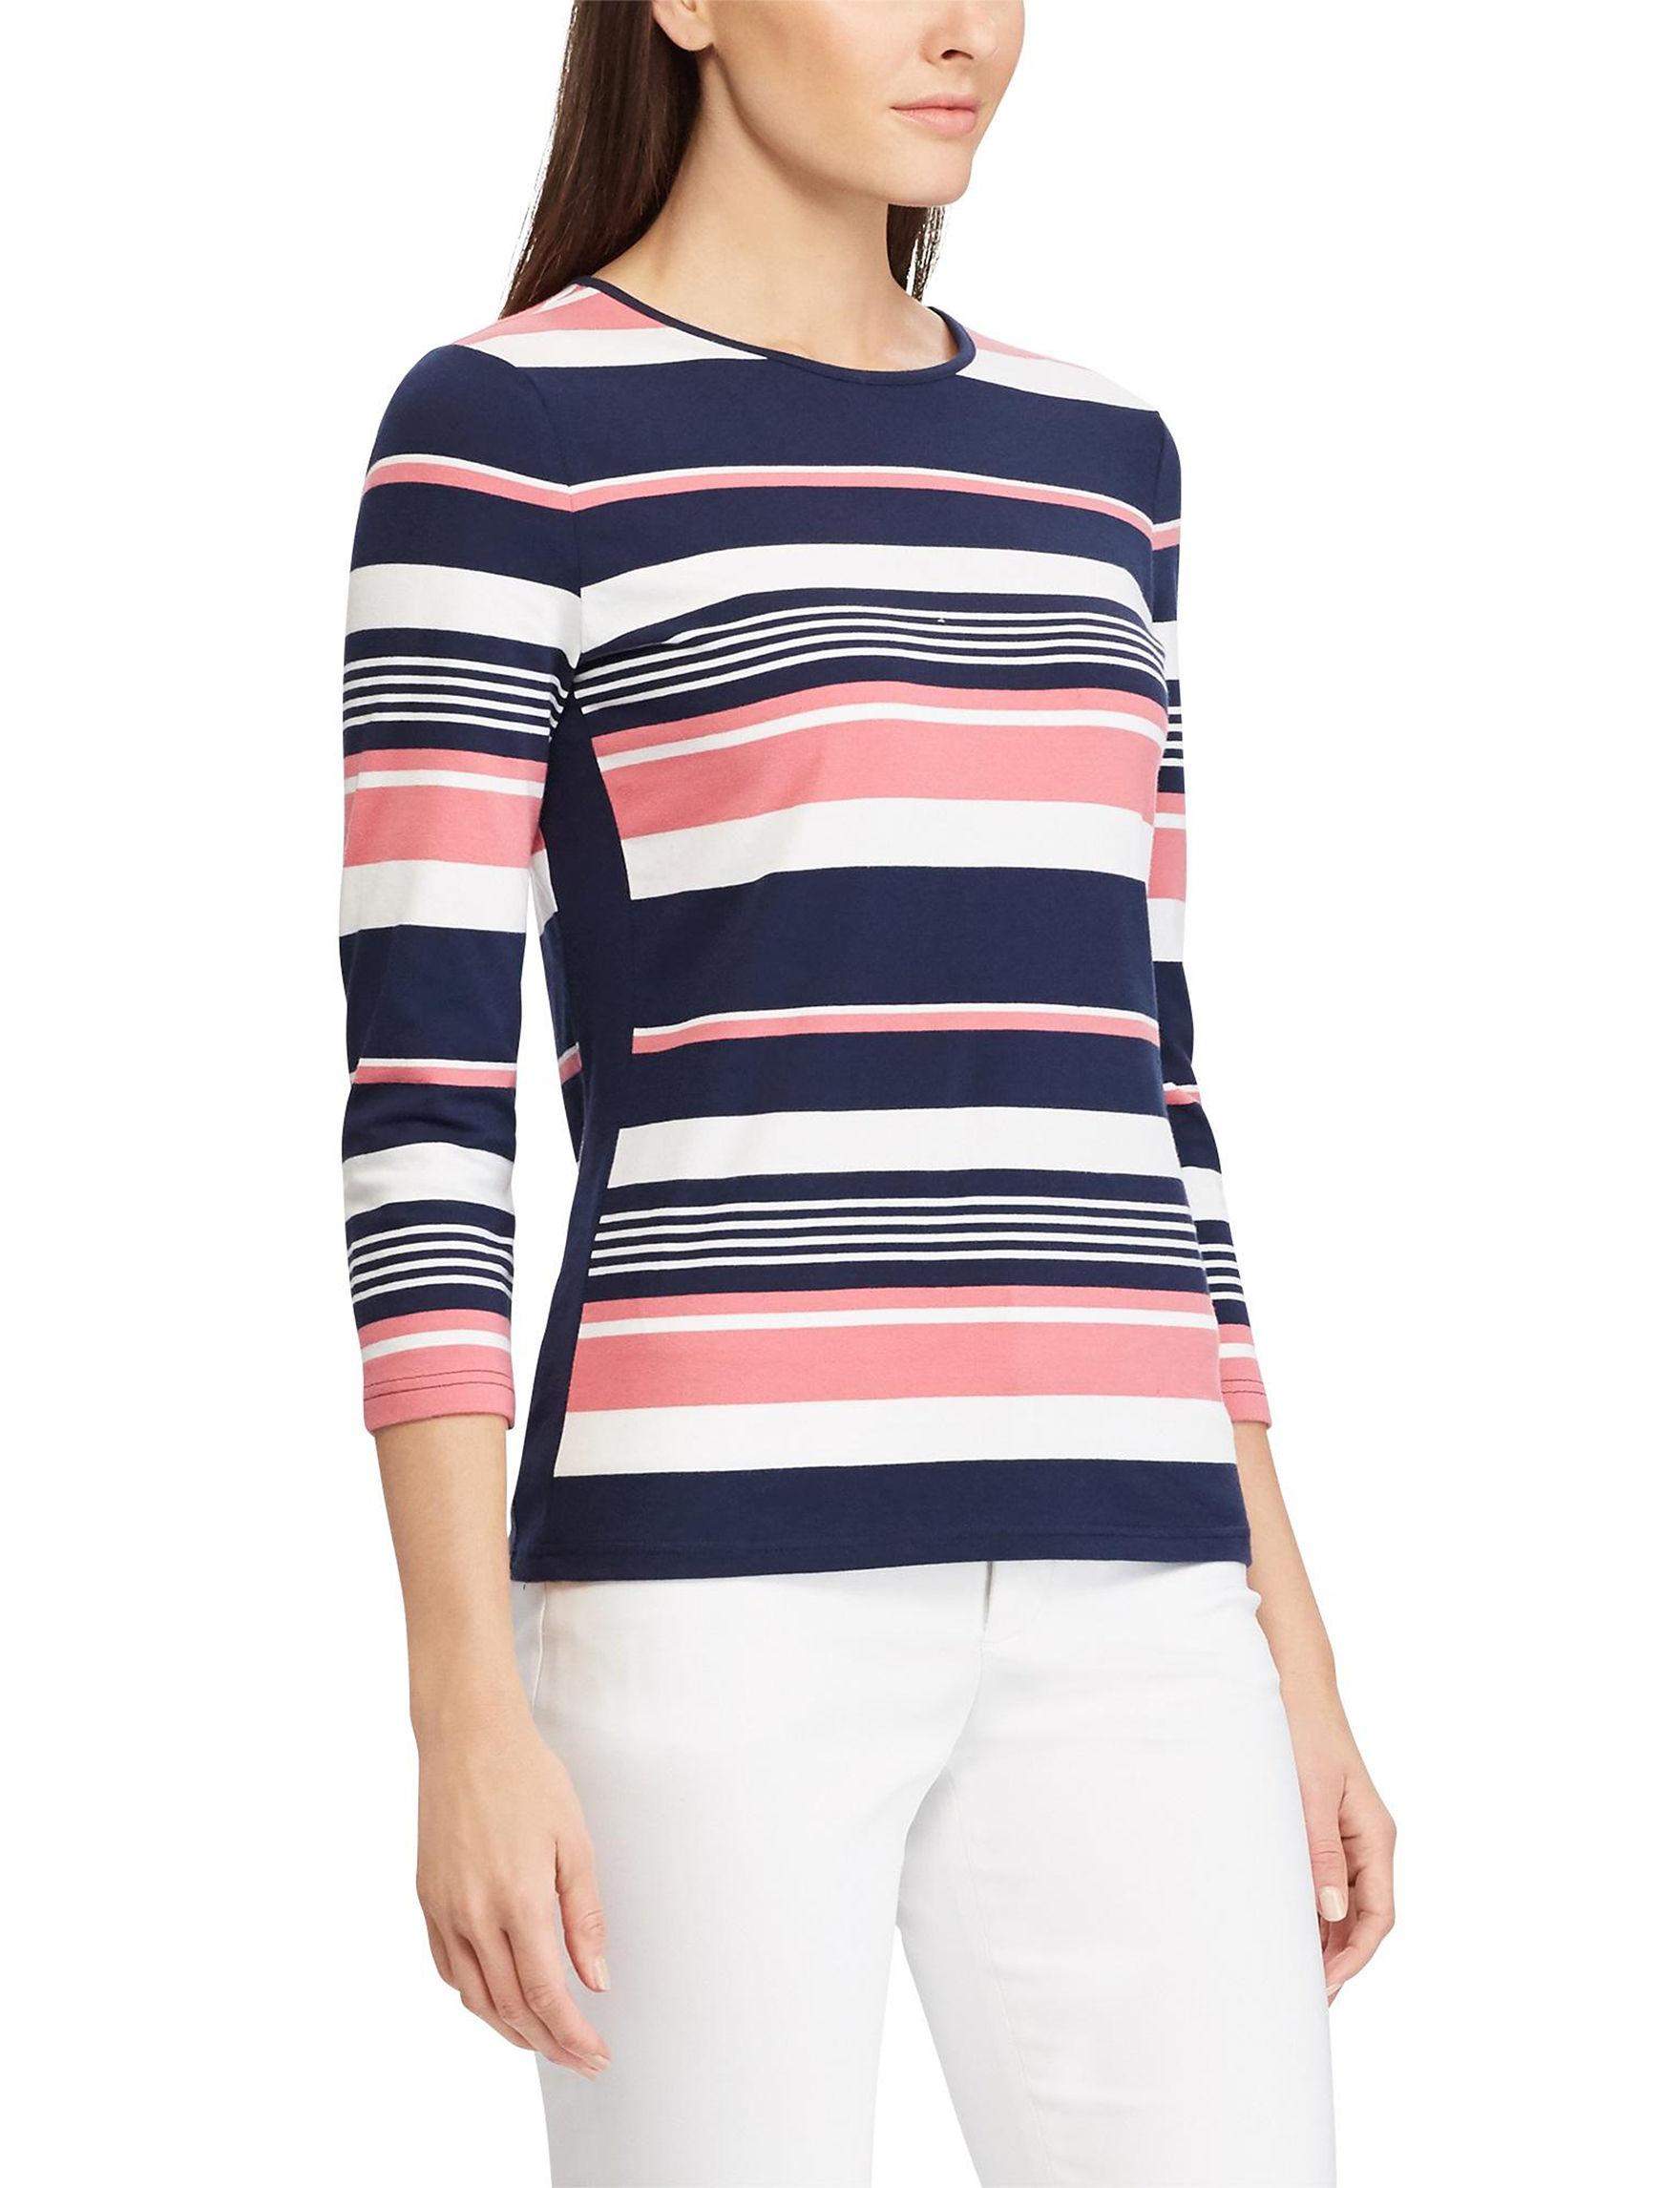 Chaps Pink Multi Shirts & Blouses